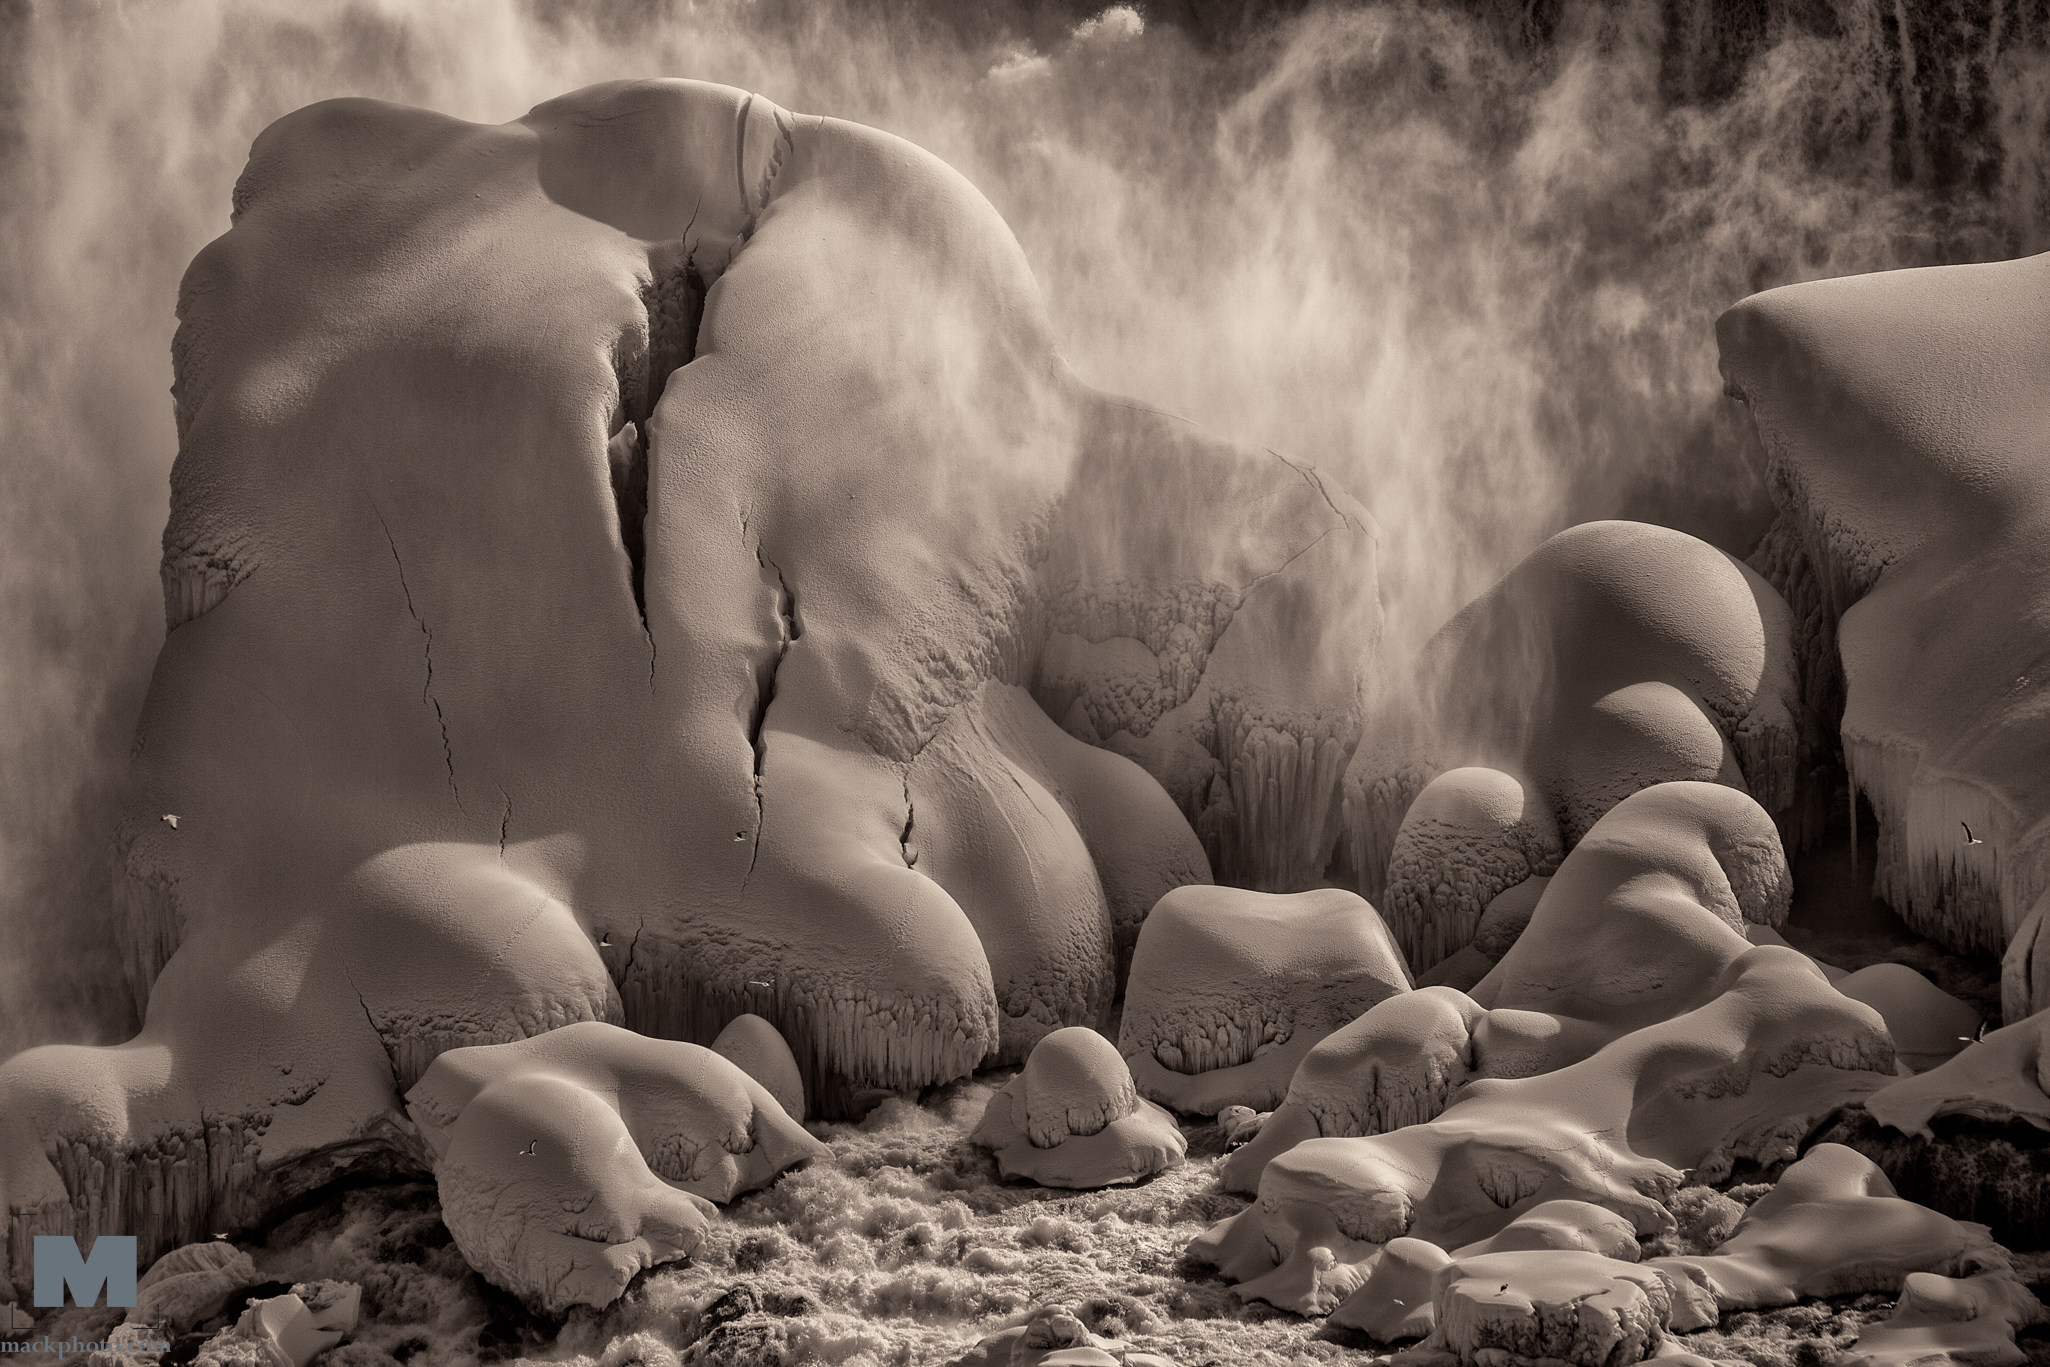 Category Fine Art Photography Award Richard Mack Photography Blog